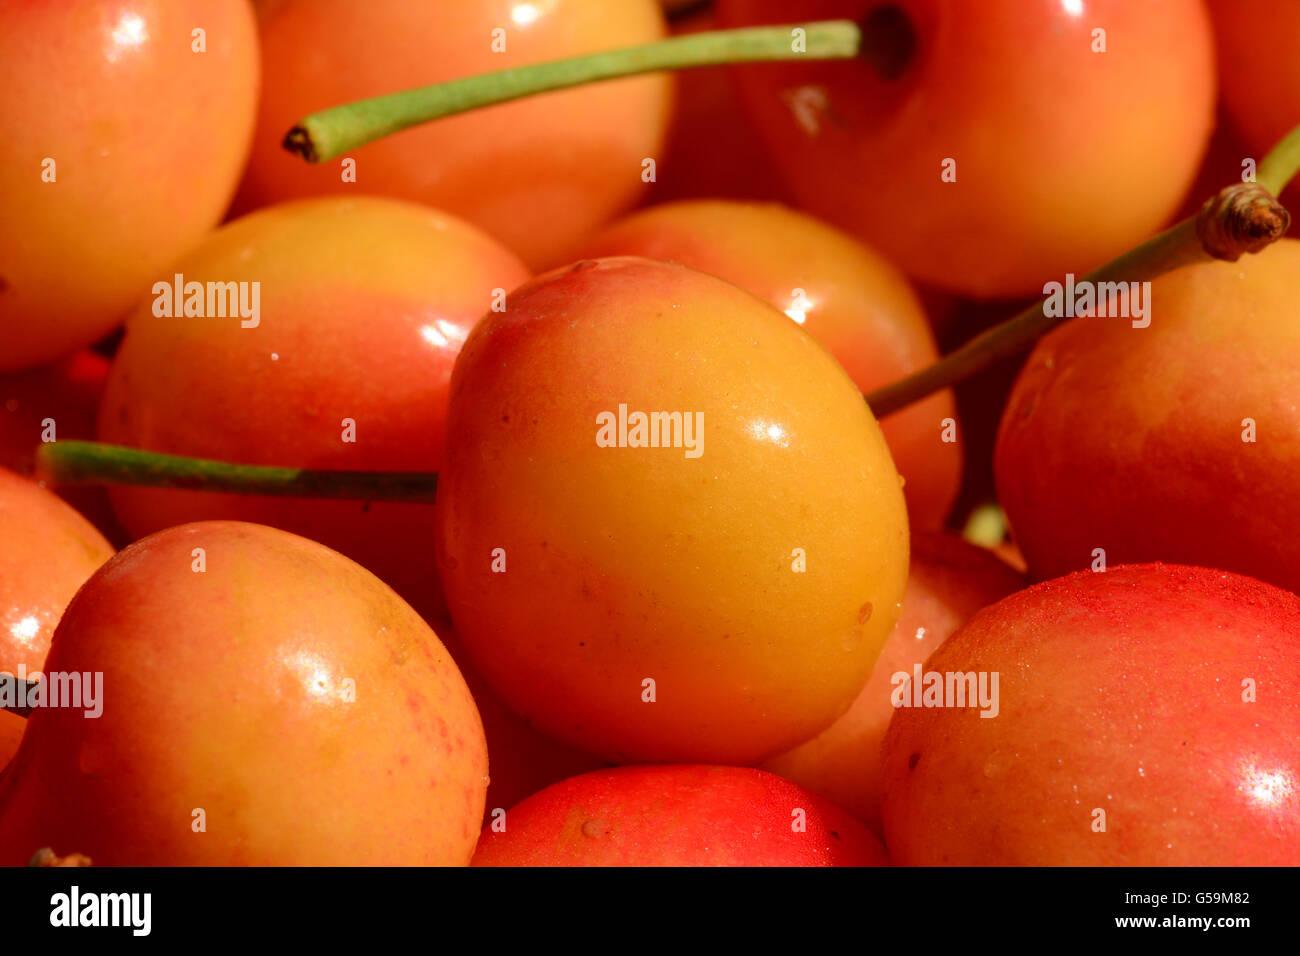 Cherries pile close up - Stock Image